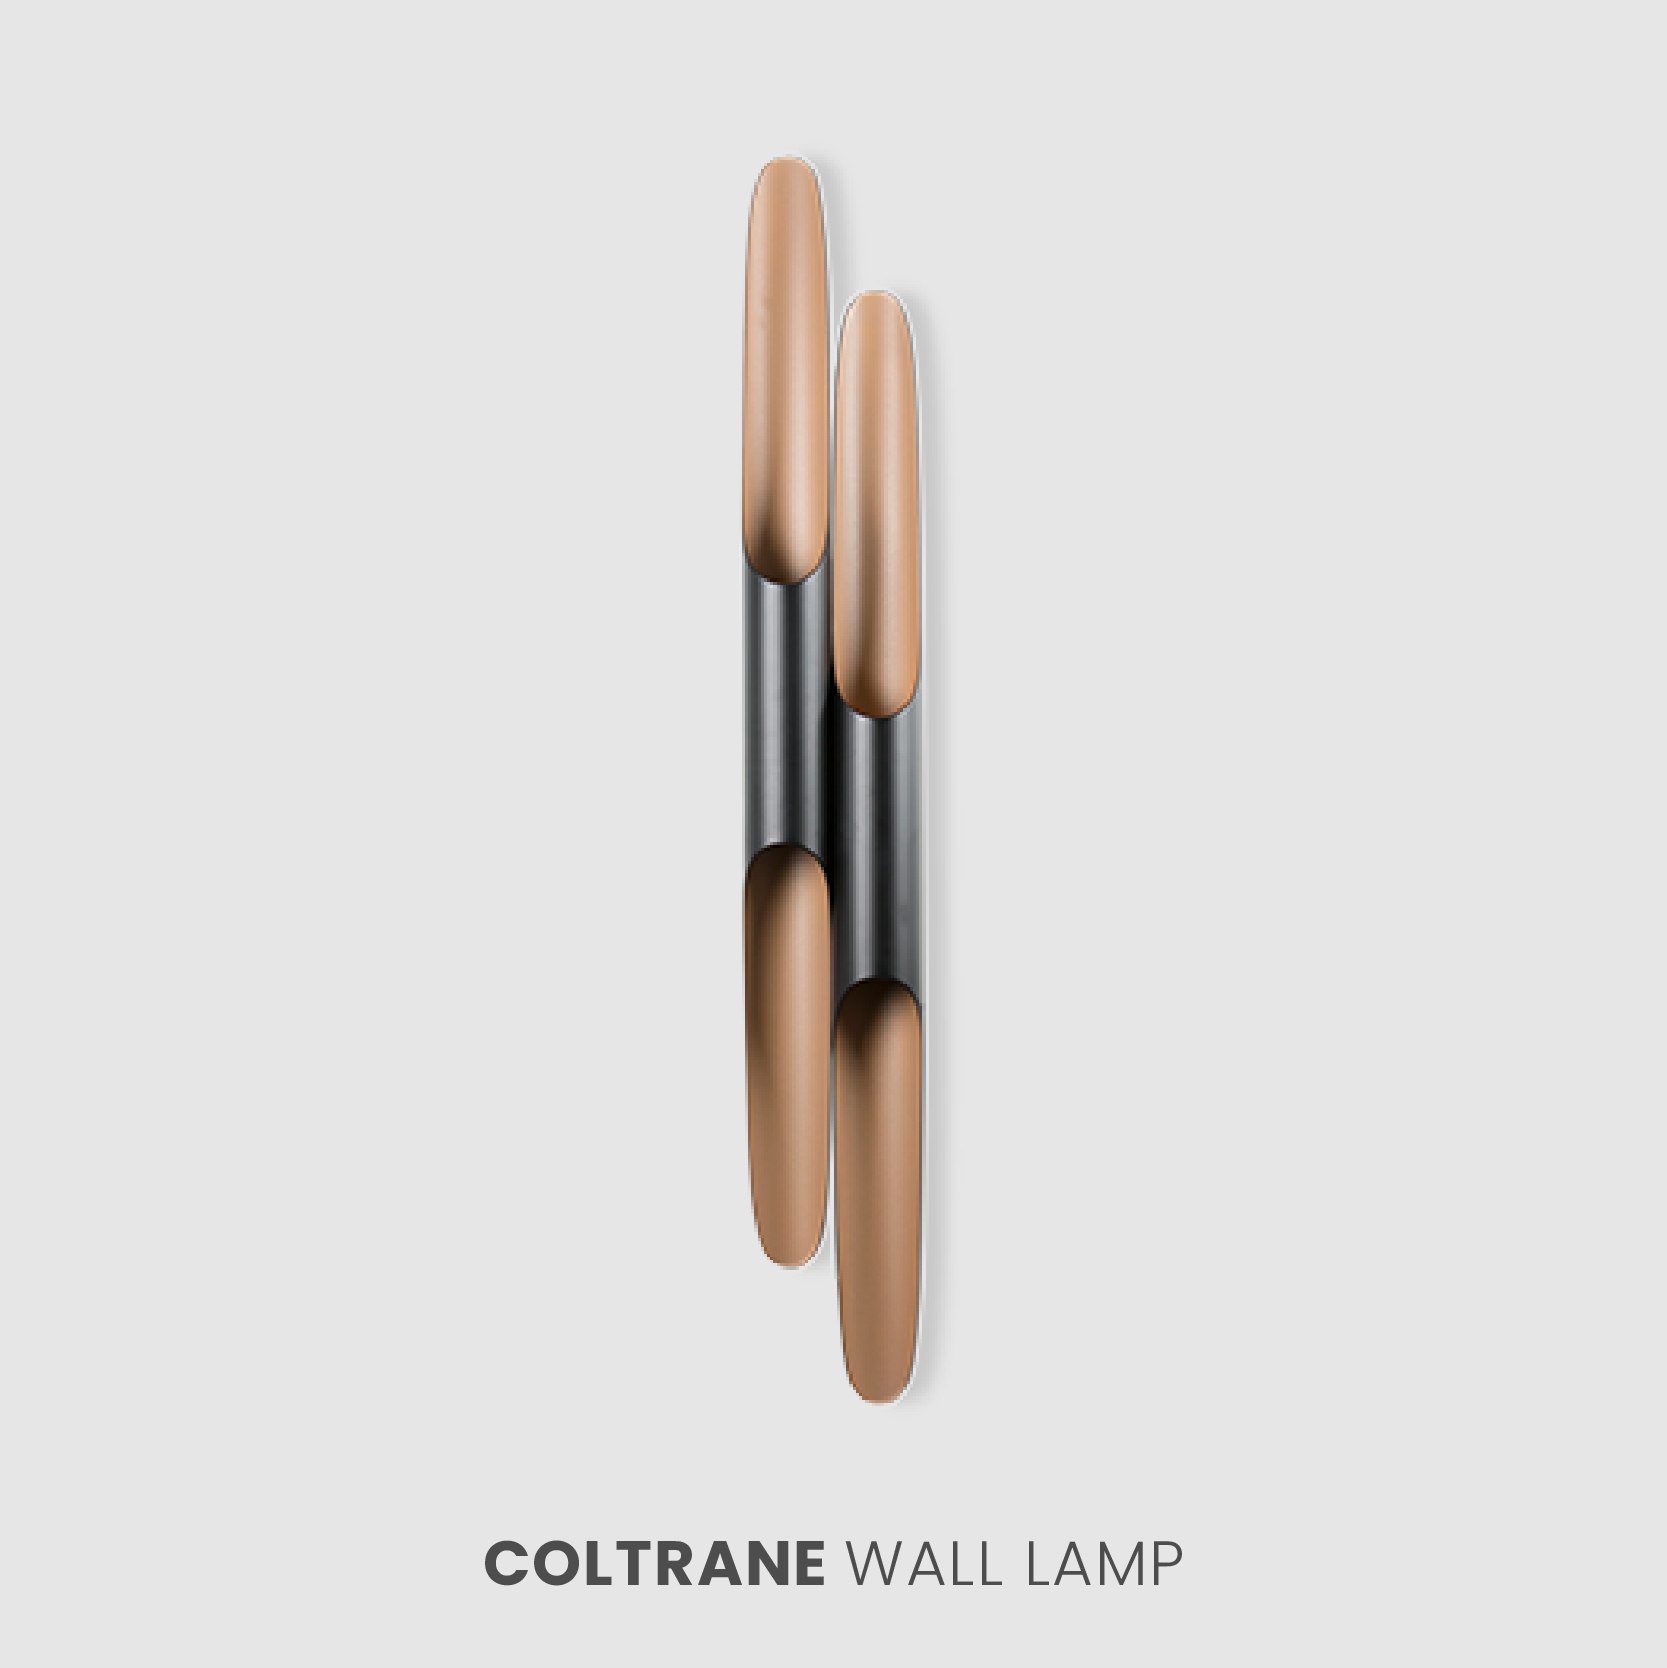 Coltrane Wall